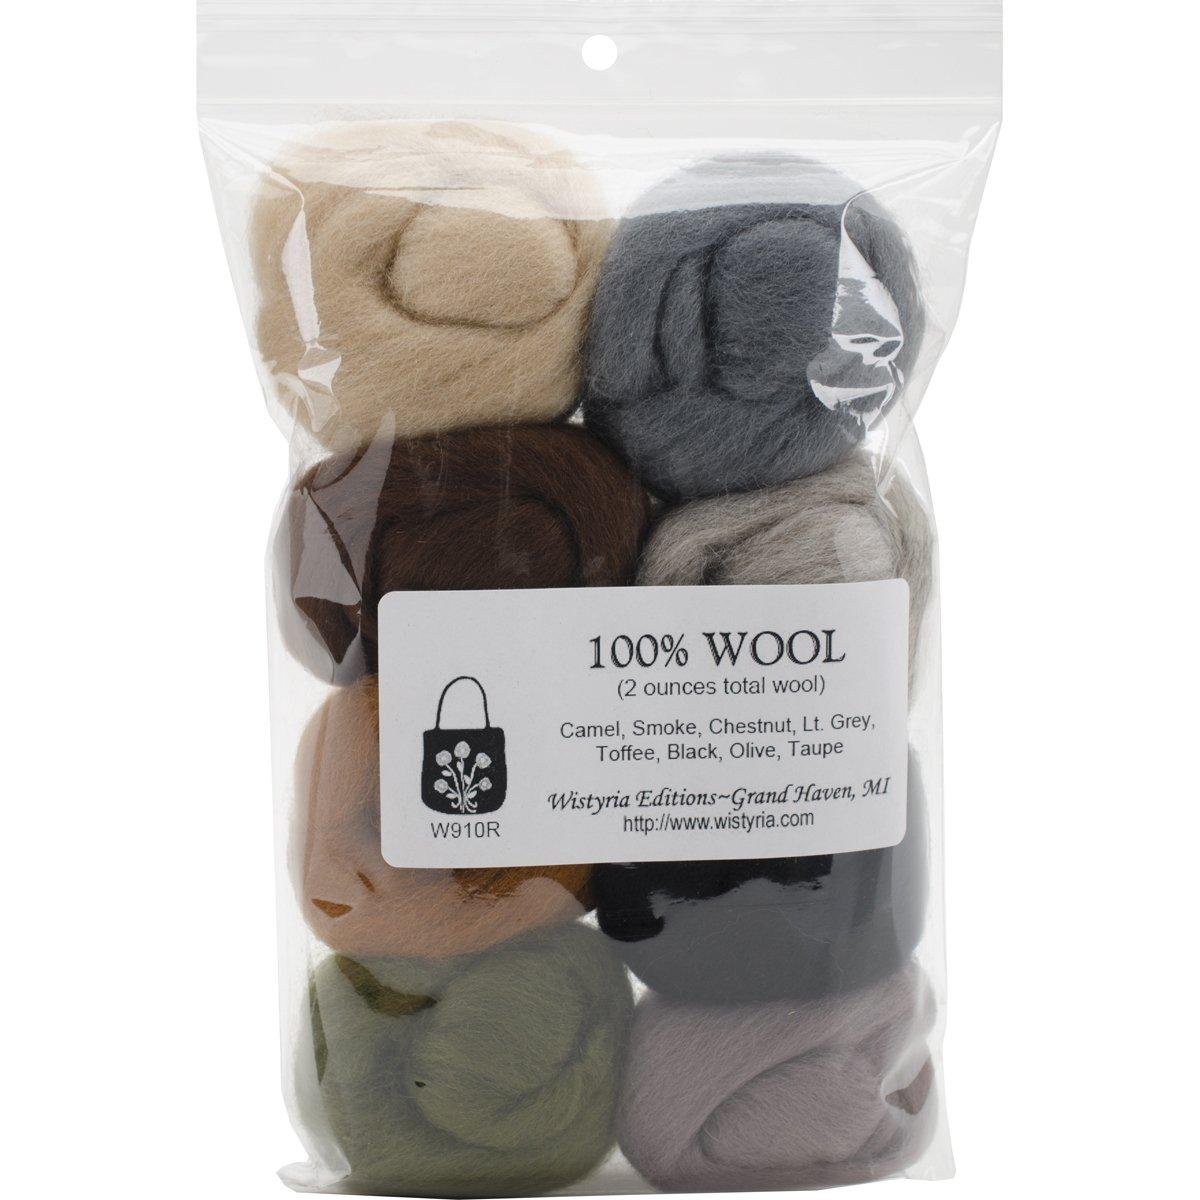 Wistyria Editions Wool Roving (8 Pack).22oz, Rustic